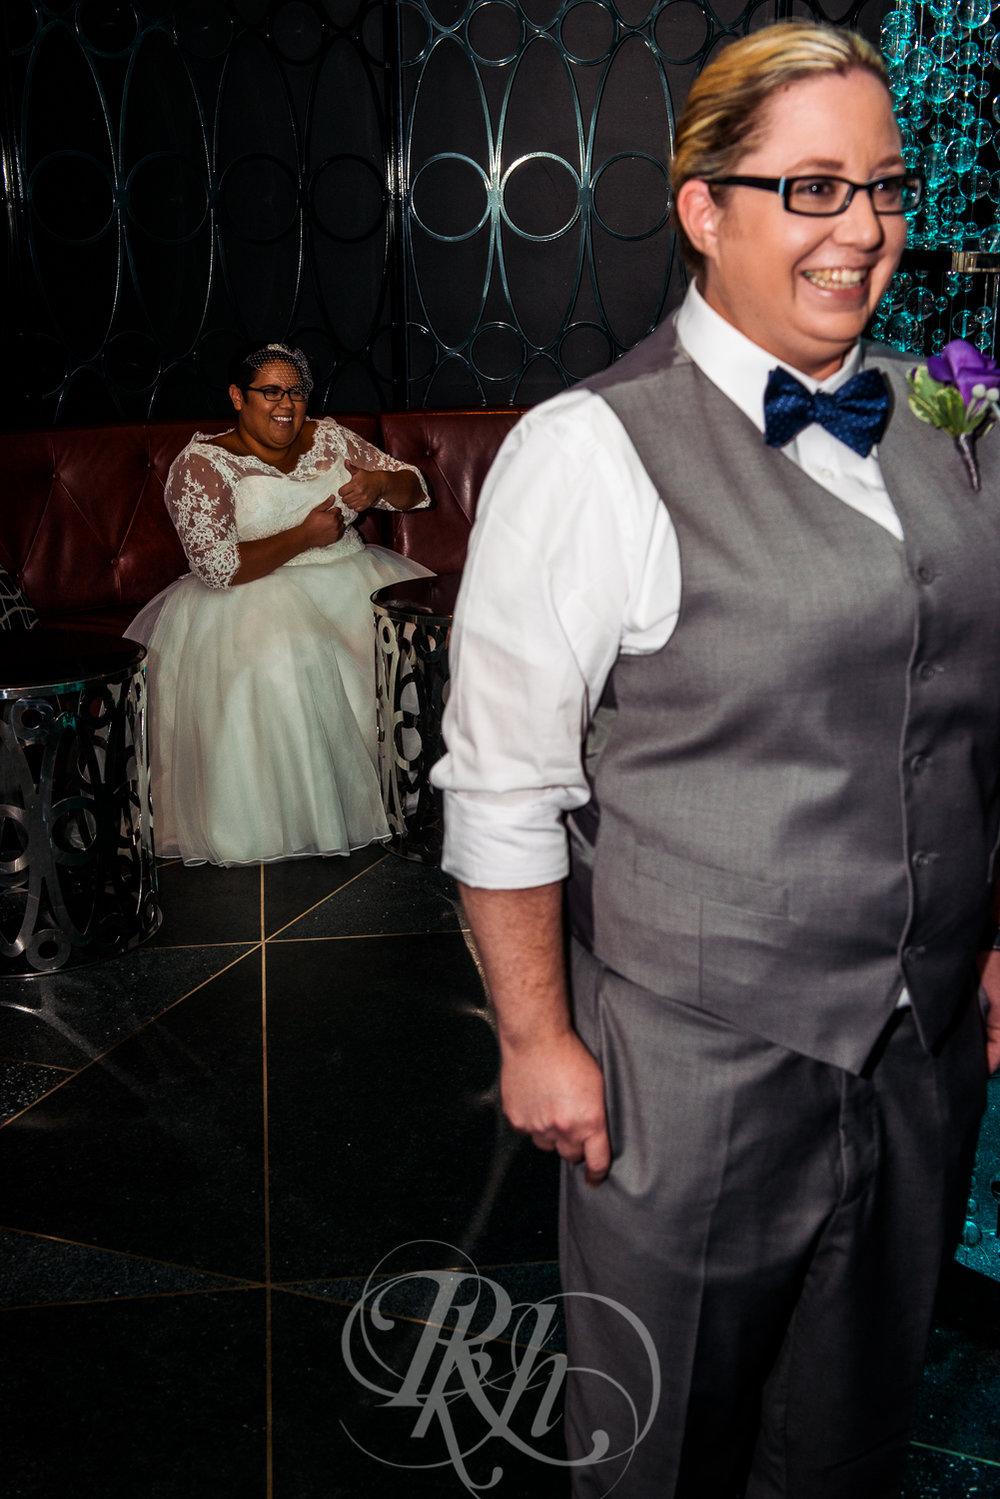 Beth & Clarissa - Minnesota LGBT Wedding Photography - RKH Images - Blog -10.jpg